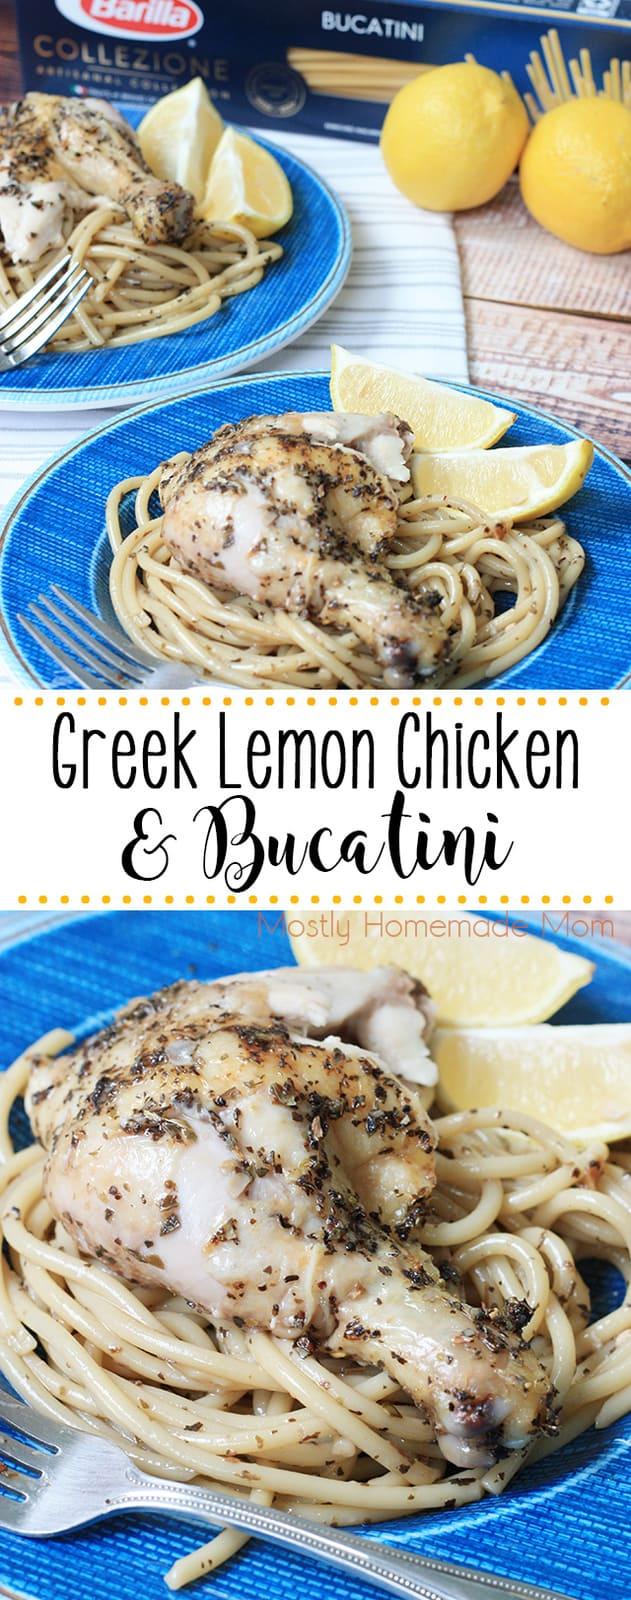 Greek Lemon Chicken seasoned with oregano, basil, garlic, and olive oil and served over delicious bucatini pasta! #greeklemonchicken #dinner #recipe #chicken